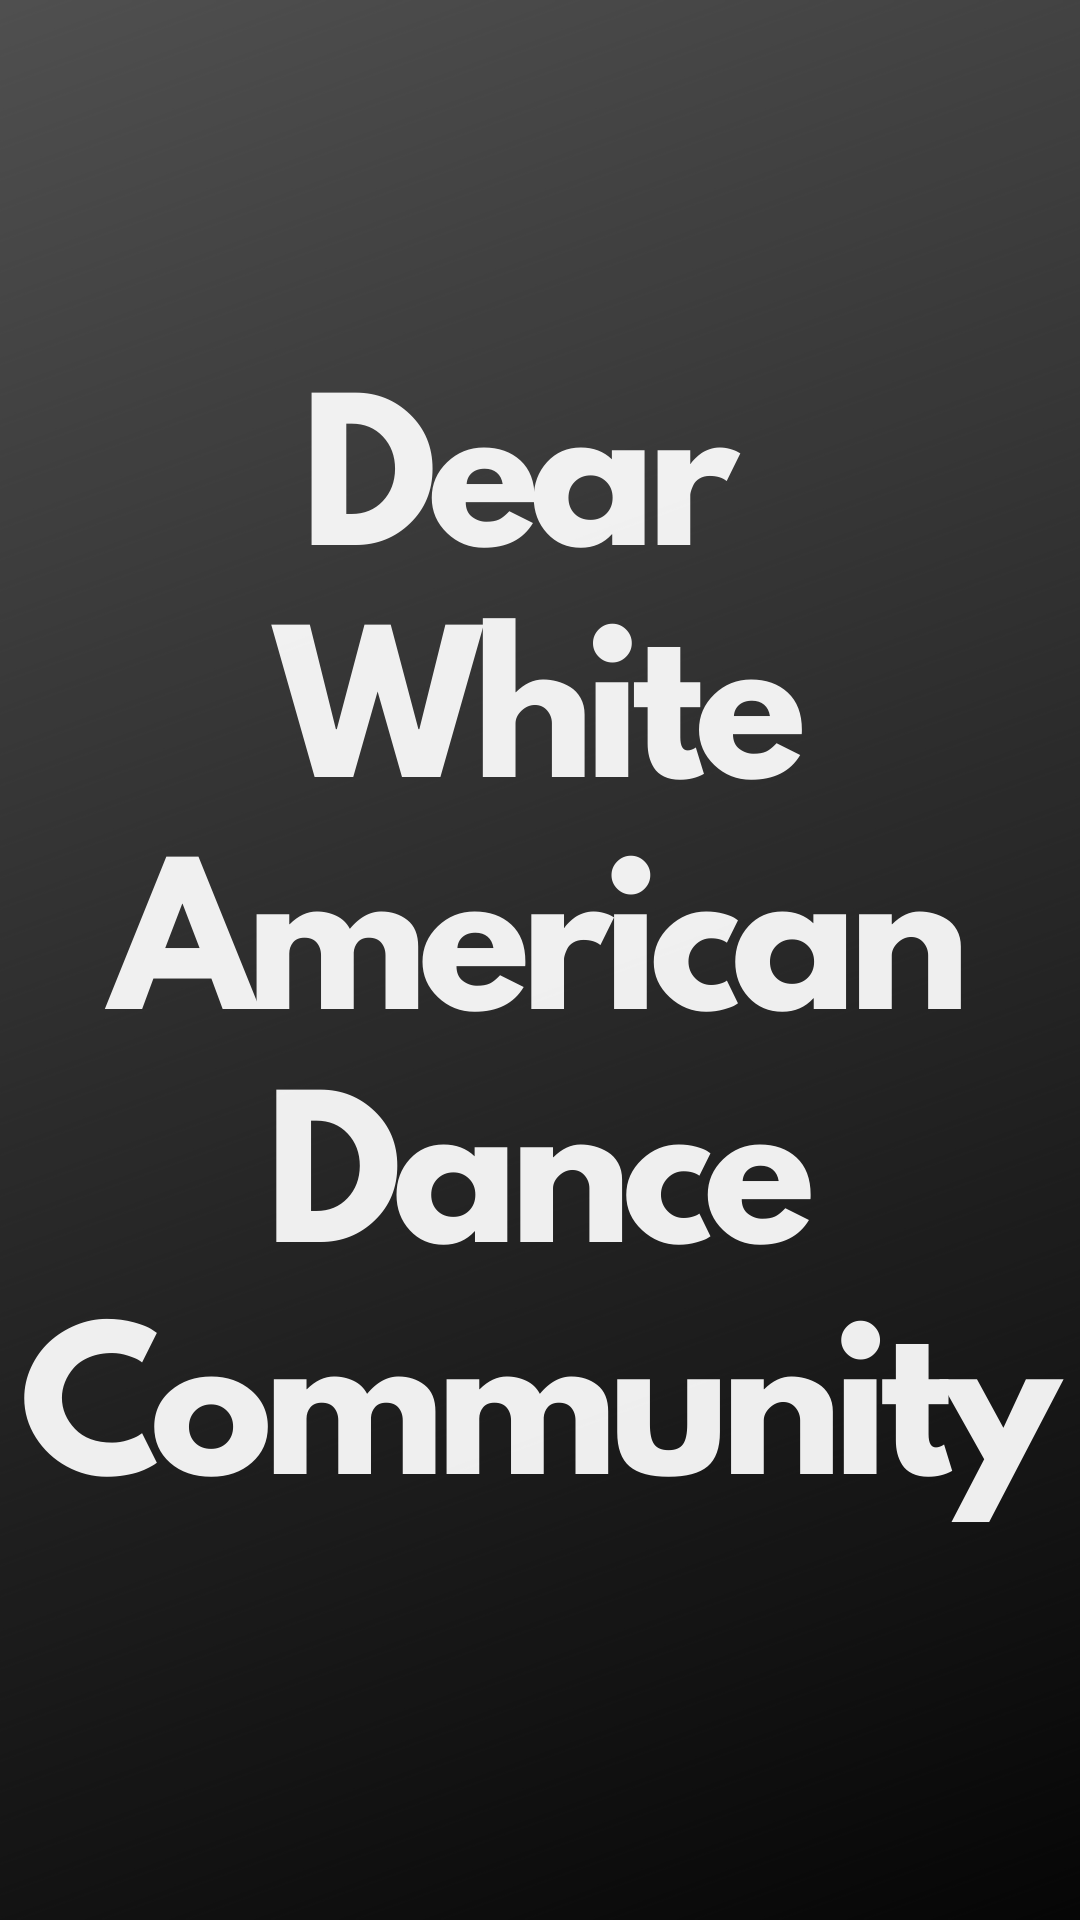 Dear White American Dance Community